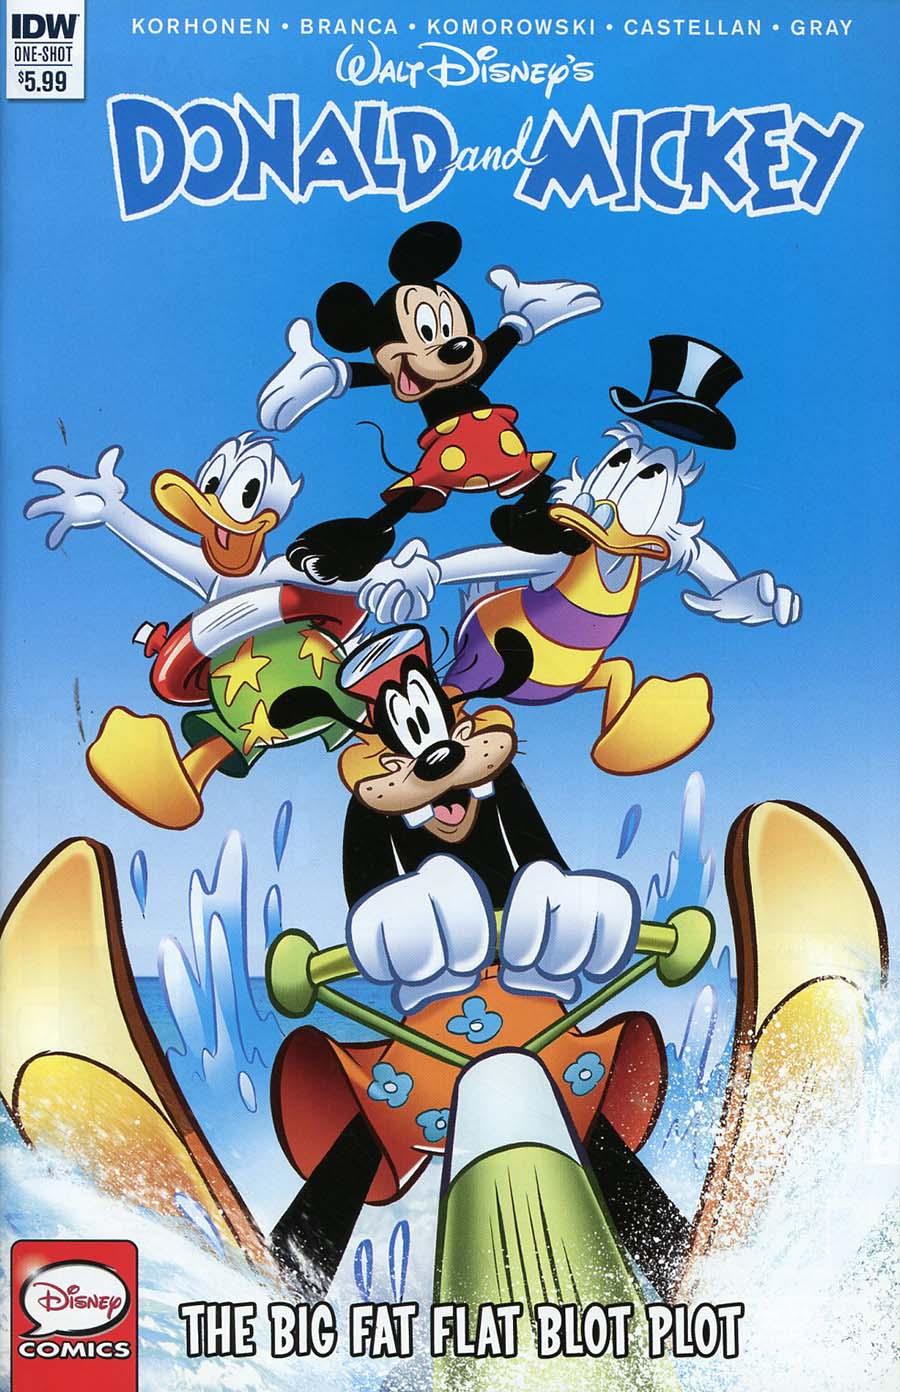 Donald And Mickey #1 Cover B Variant Fabrizio Petrossi & Morgan Prost Cover